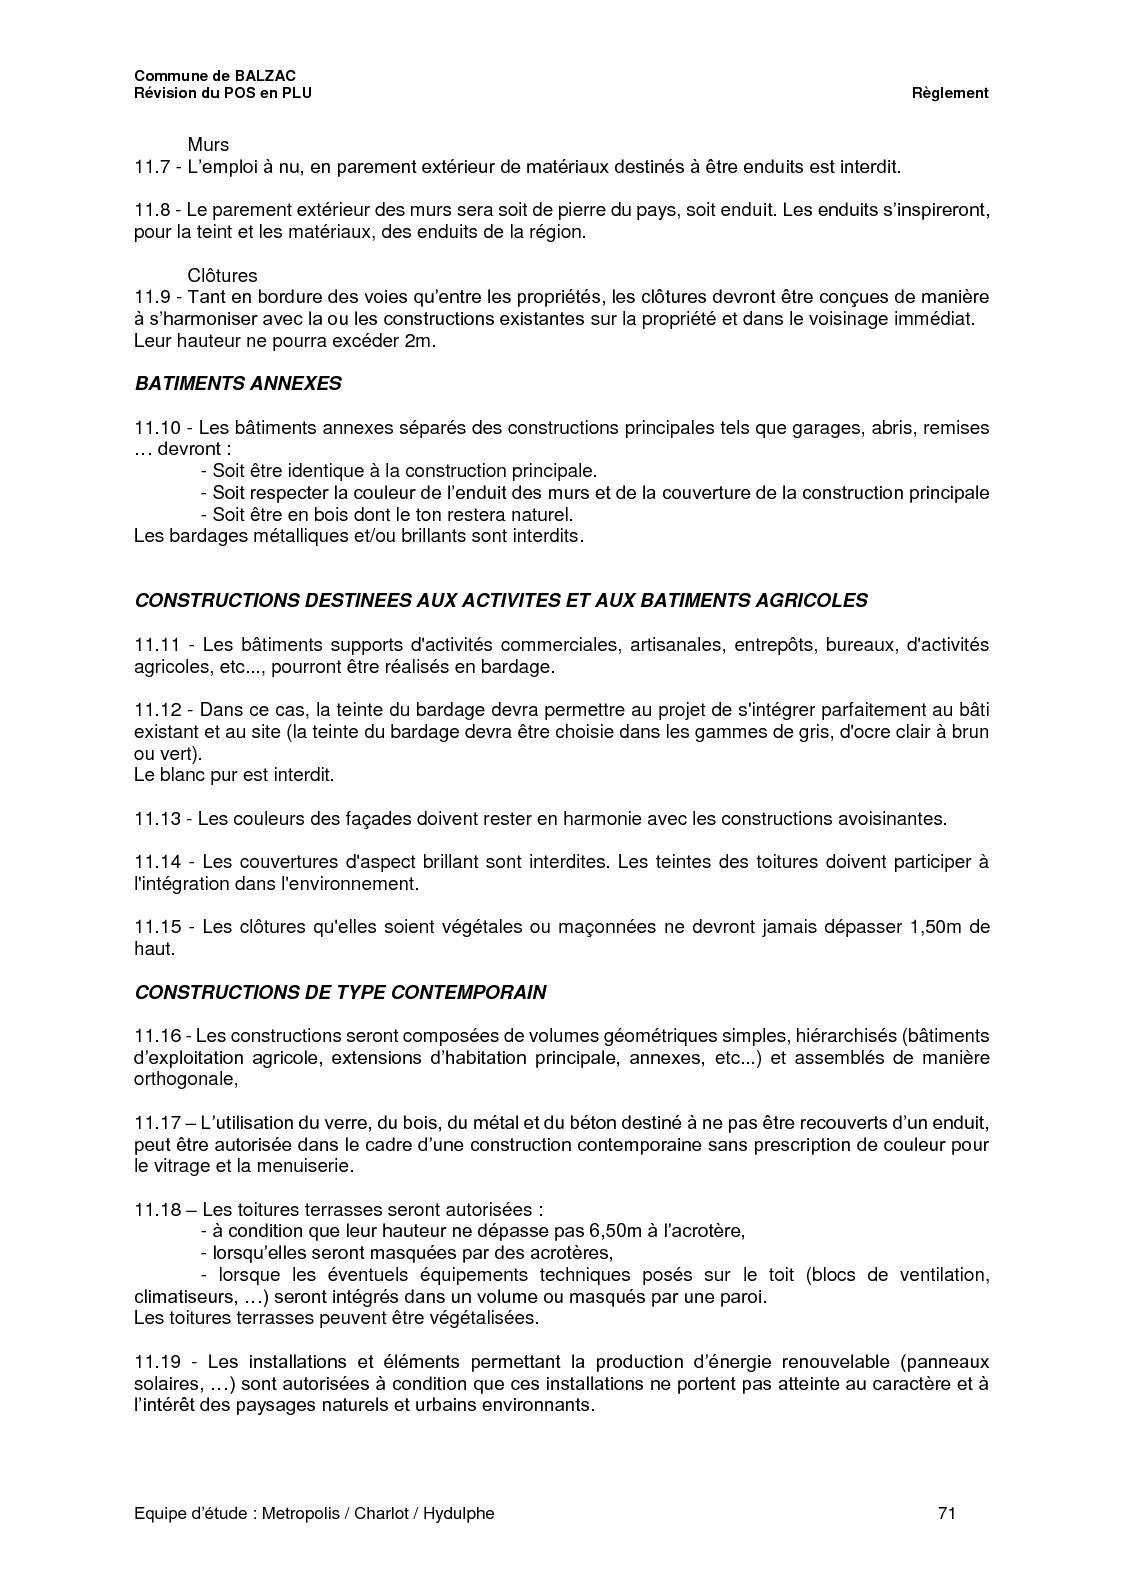 Règlement Calameo Downloader